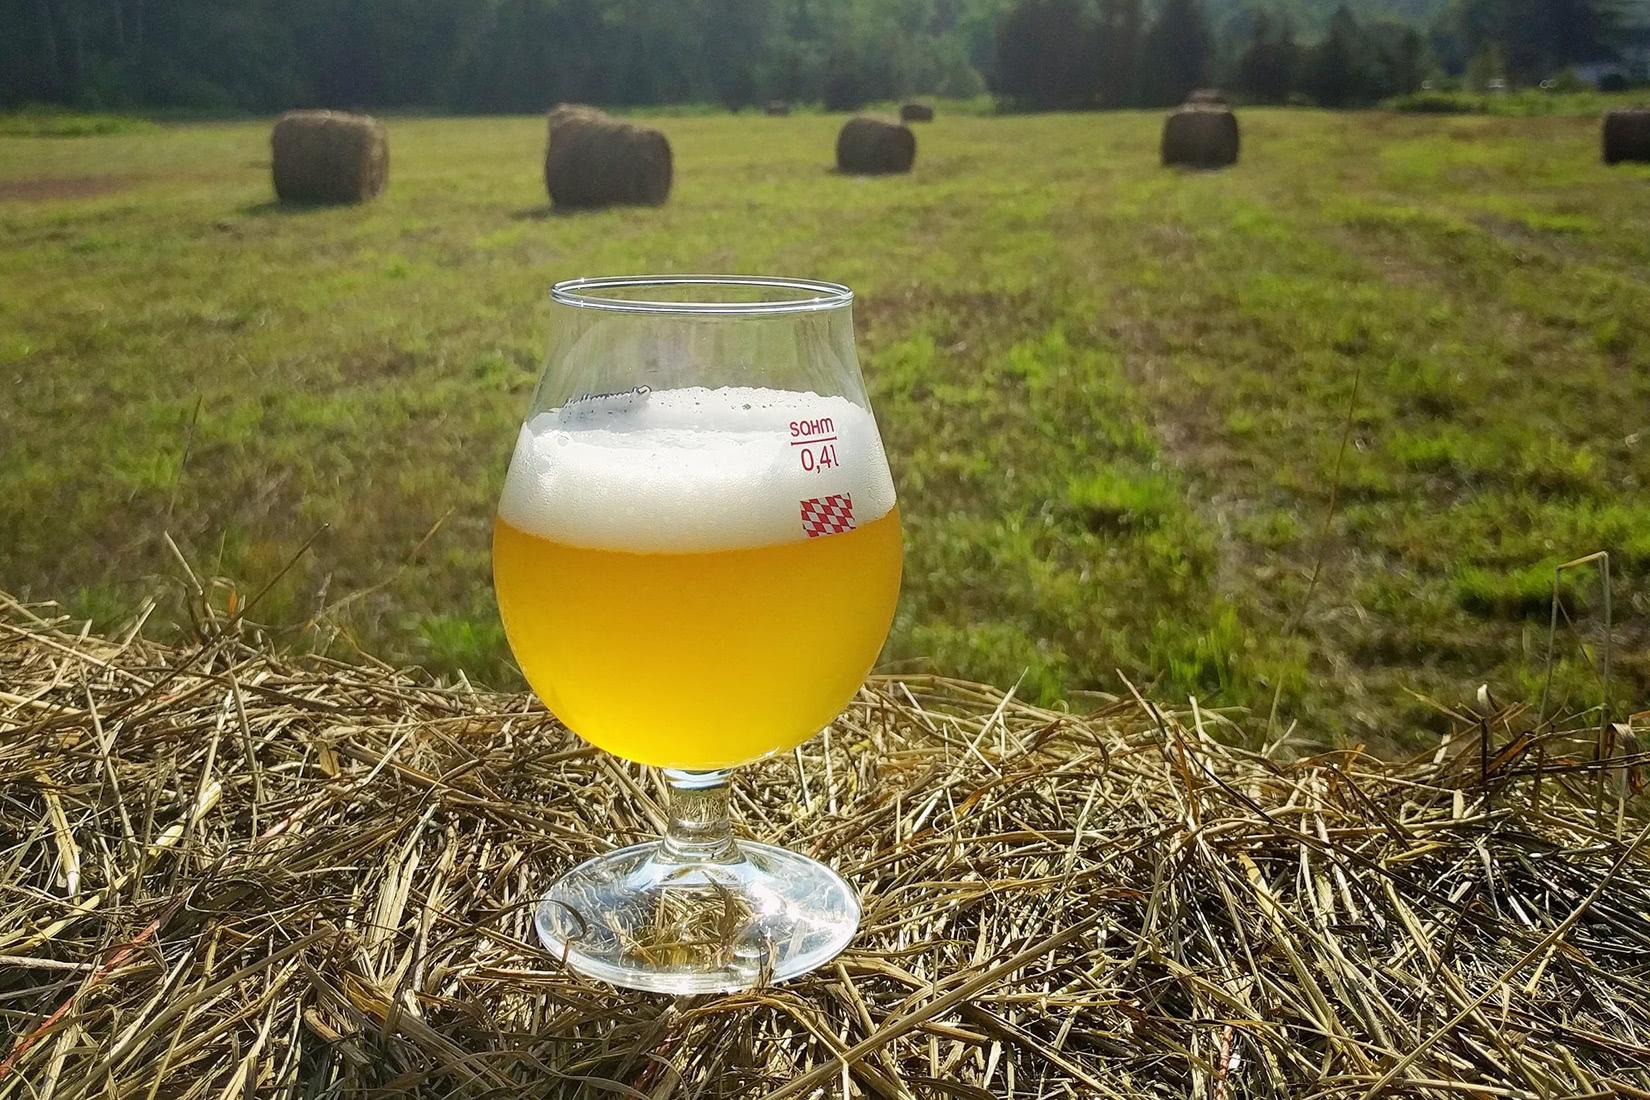 best beer brands west kill brewing - Luxe Digital